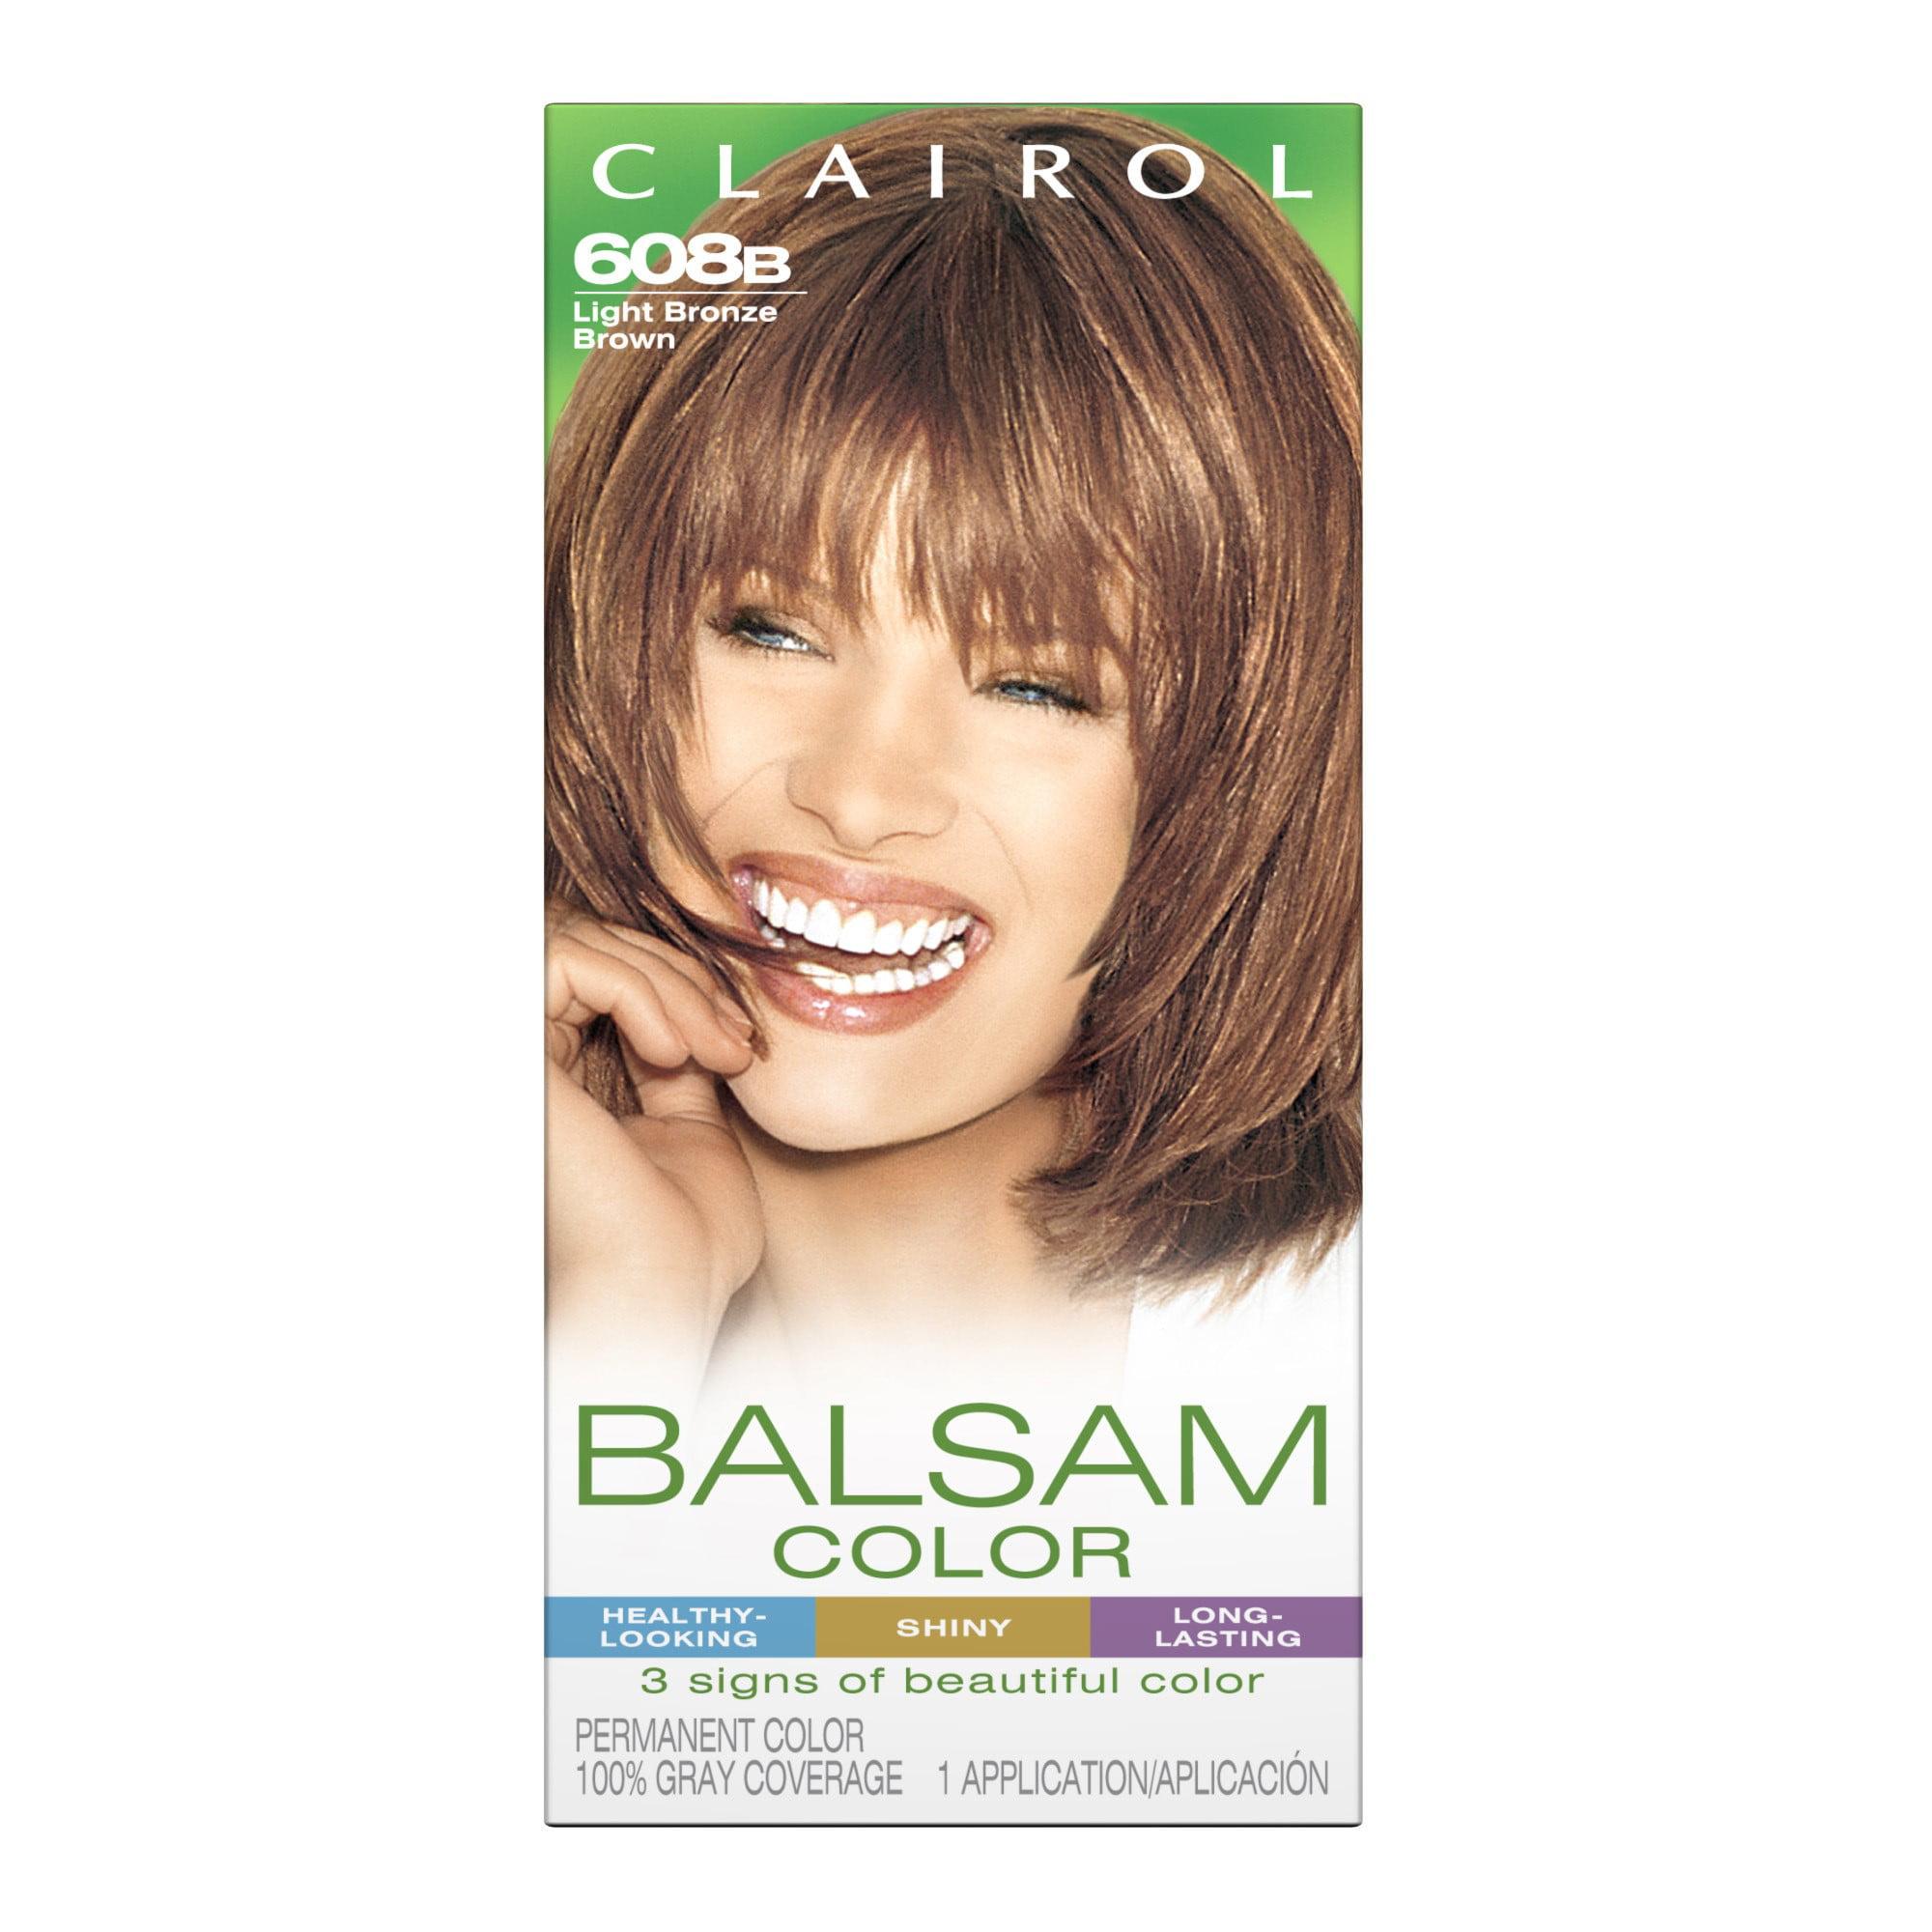 Clairol Balsam Hair Color 608b Light Bronze Brown 1 Kit Walmart